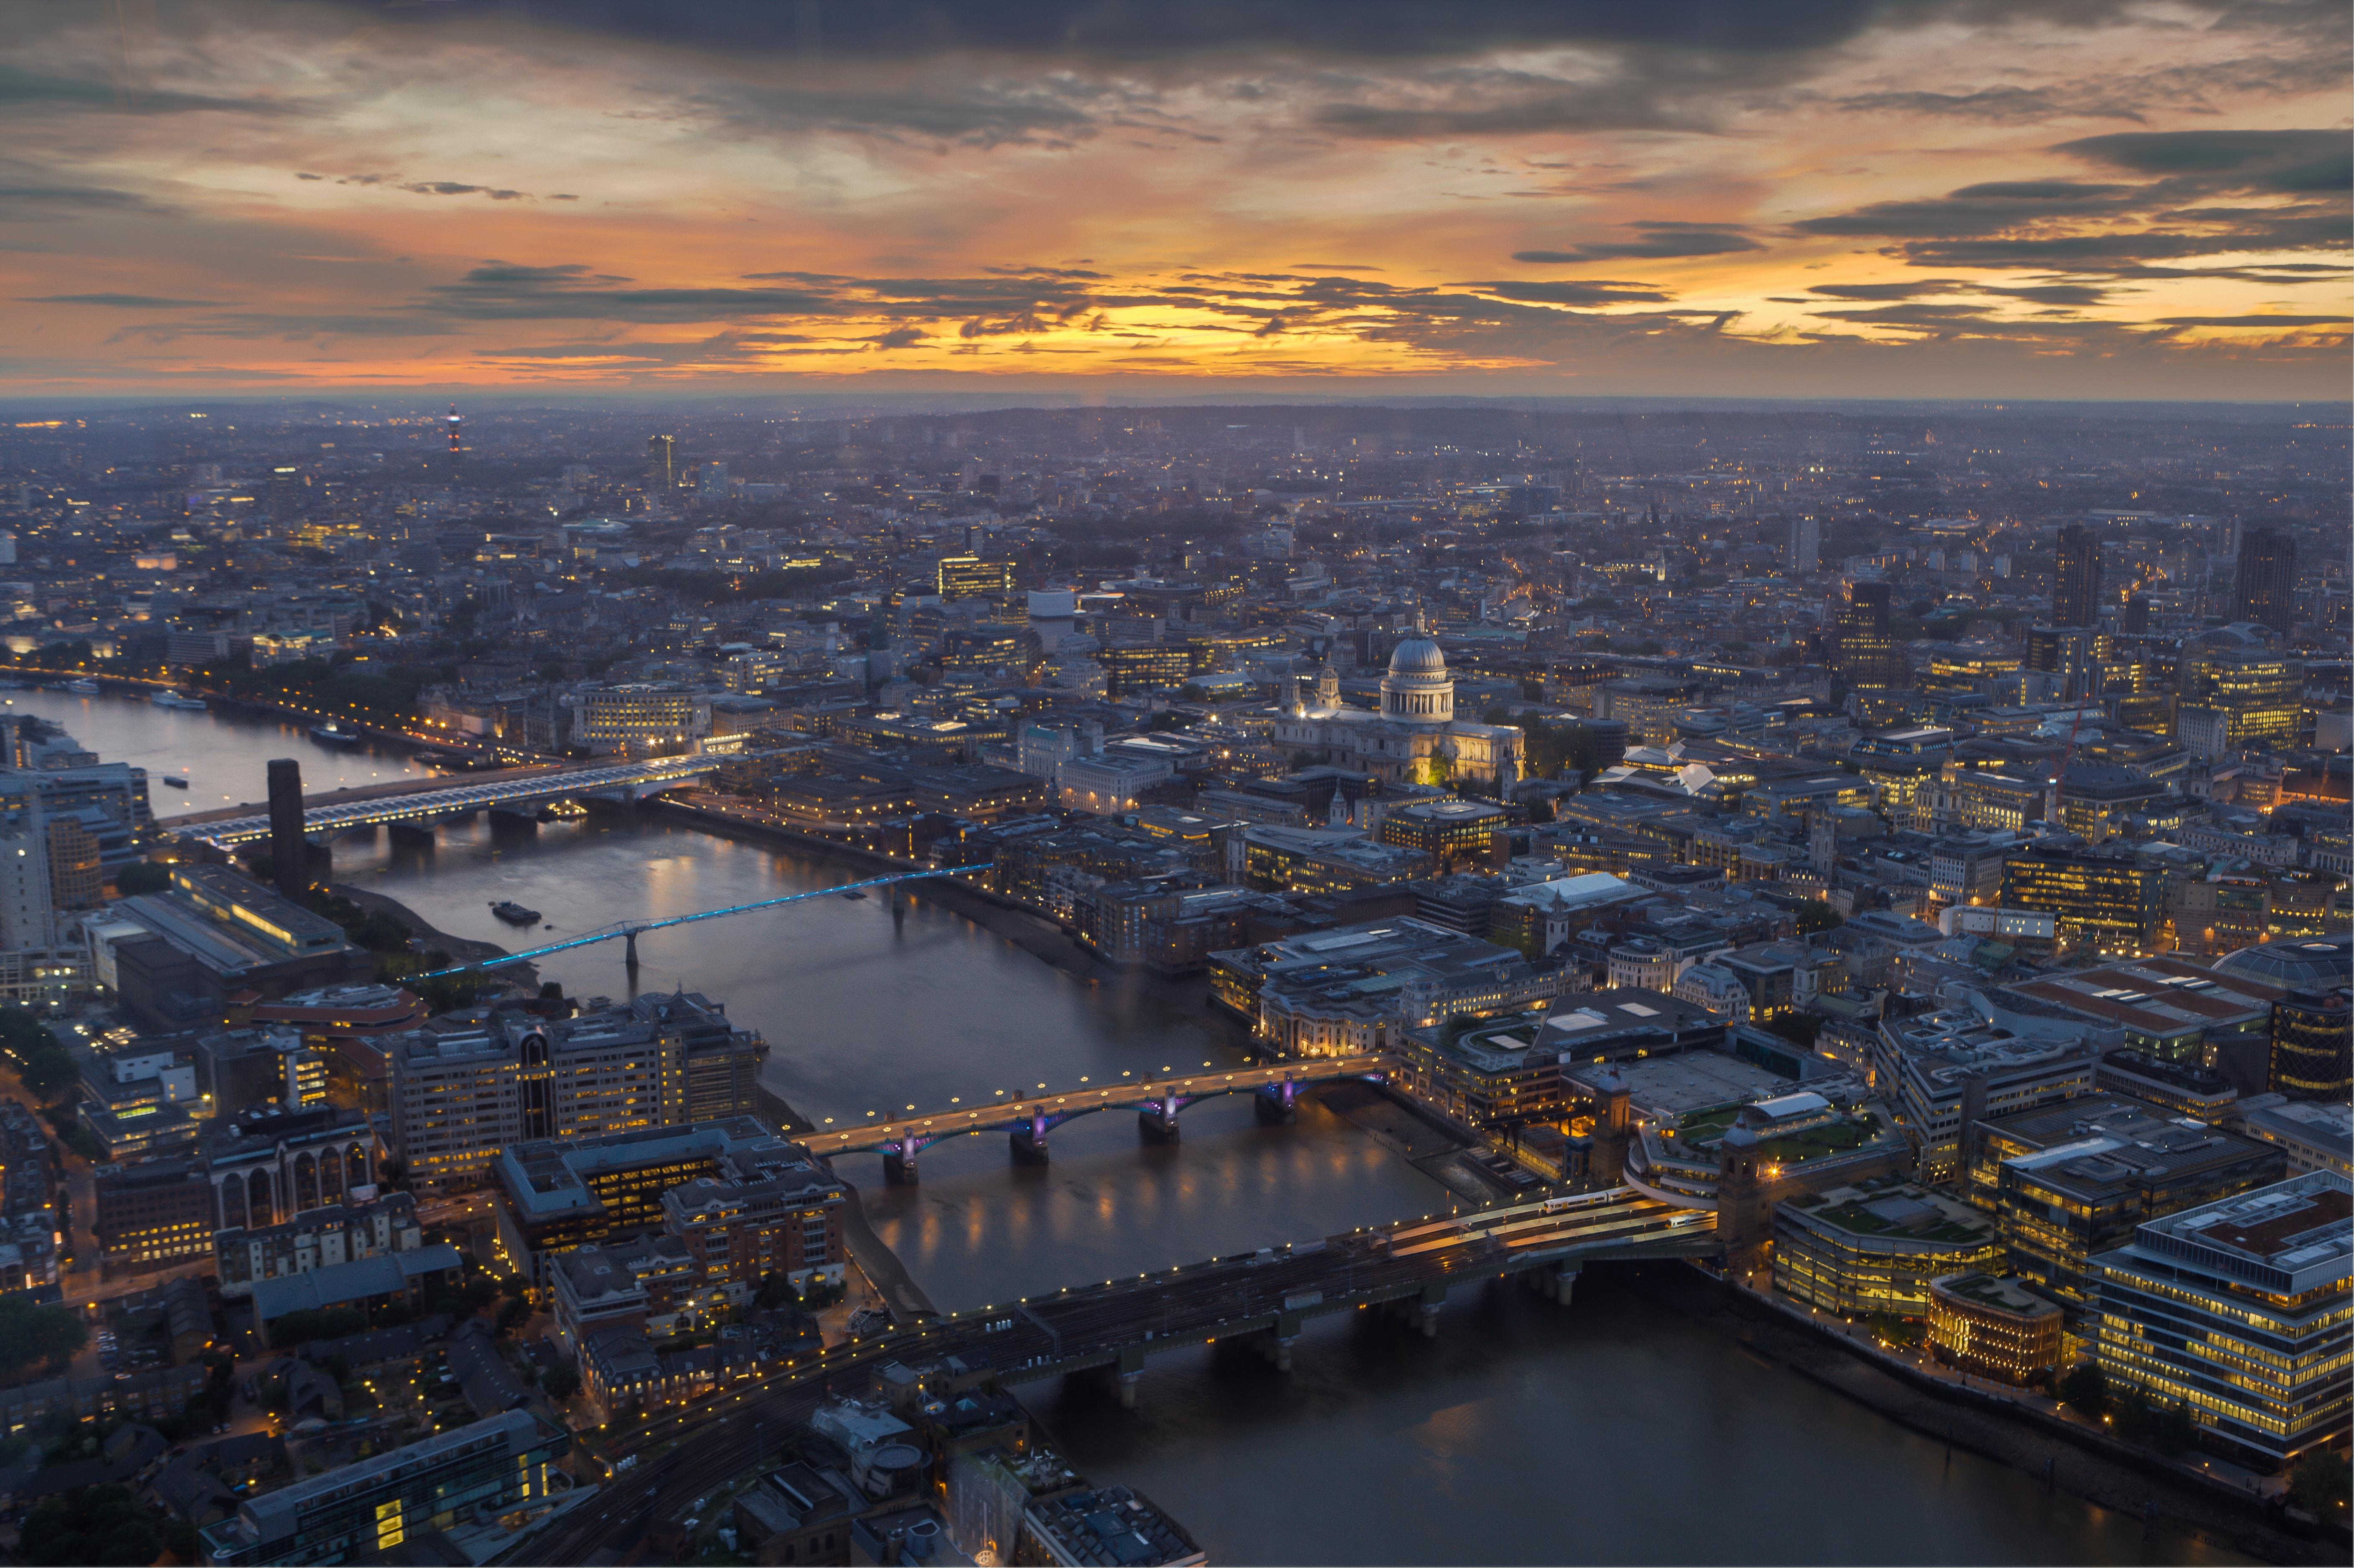 LUXURY LONDON HOTELS: LONDON HILTON ON PARK LANE REVIEW